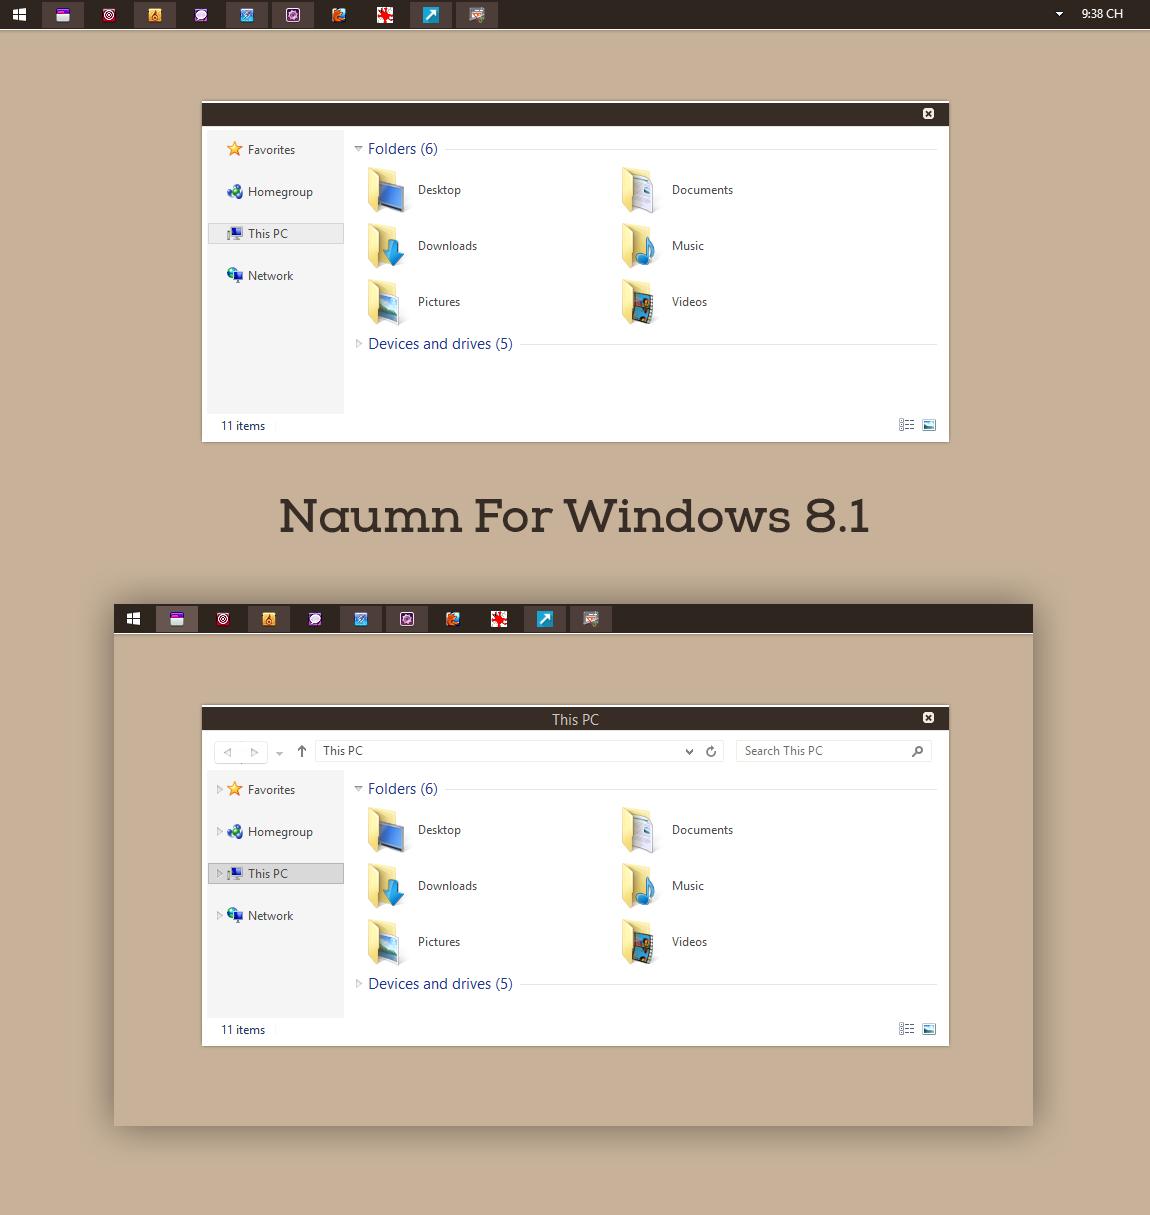 Naumn For Windows 8.1